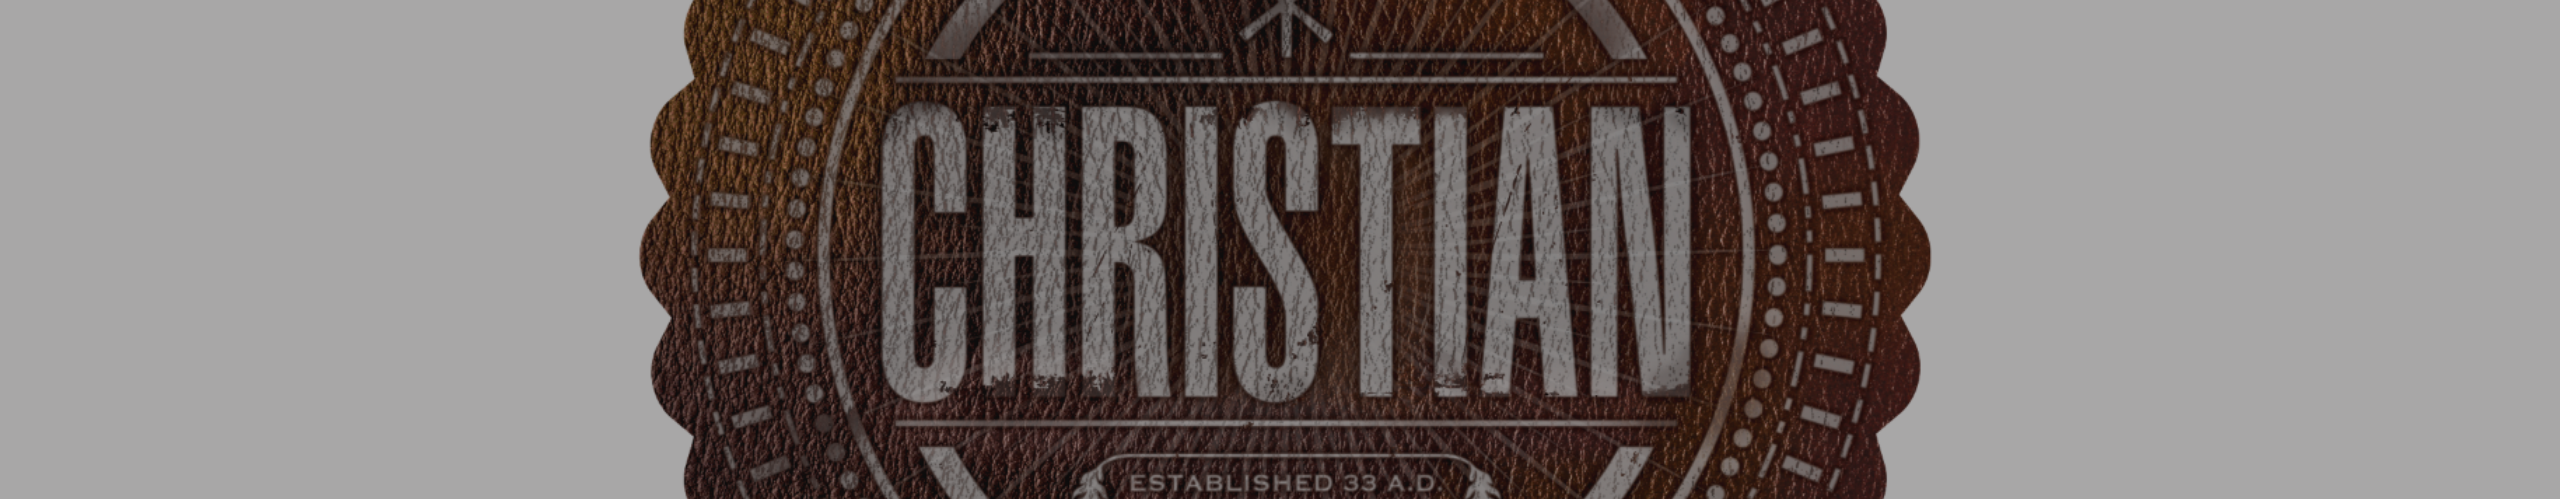 Christian-2560x499